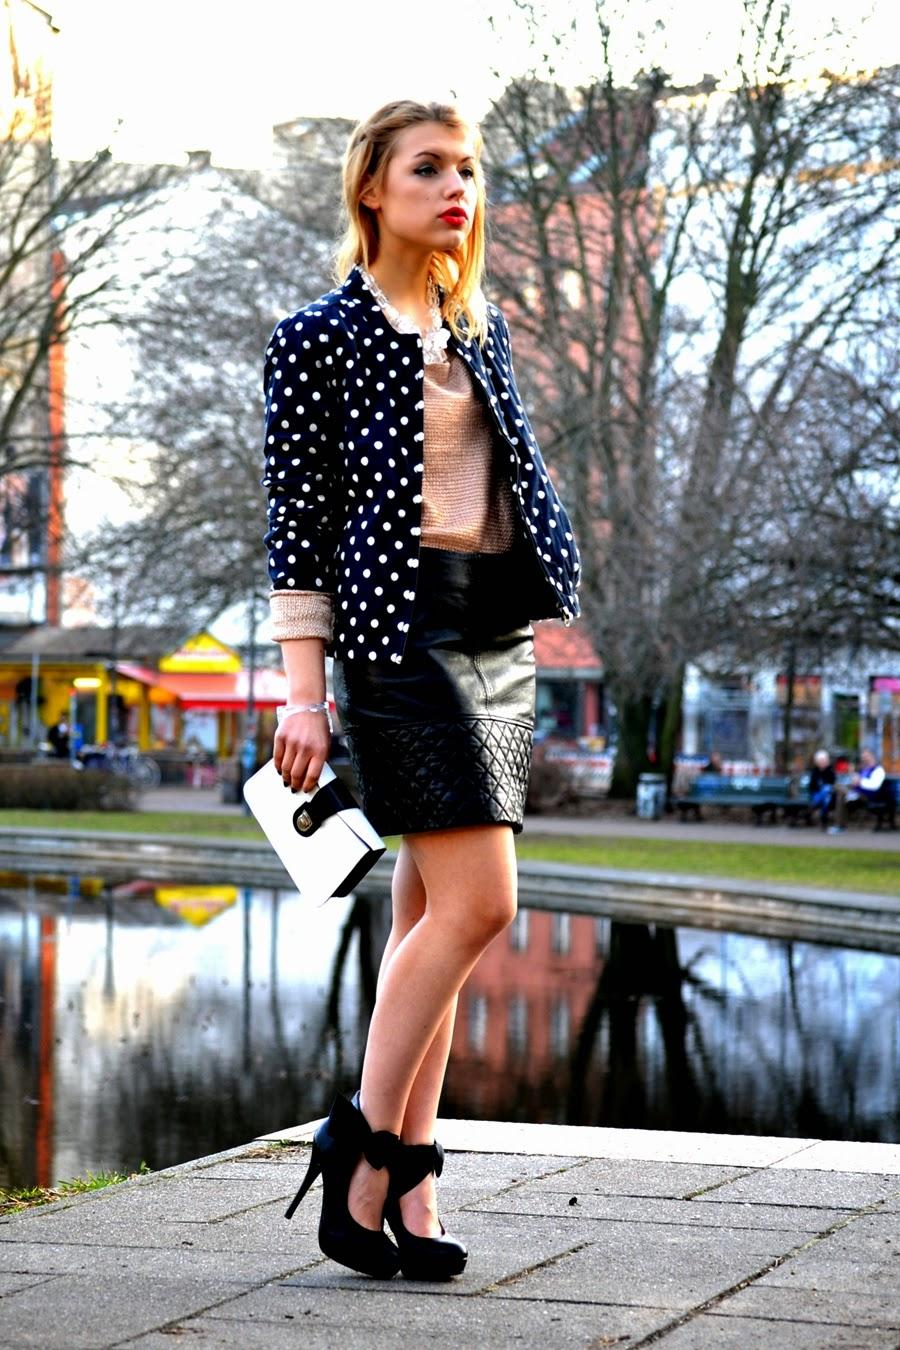 jasmin outfitpost myberlinfashion